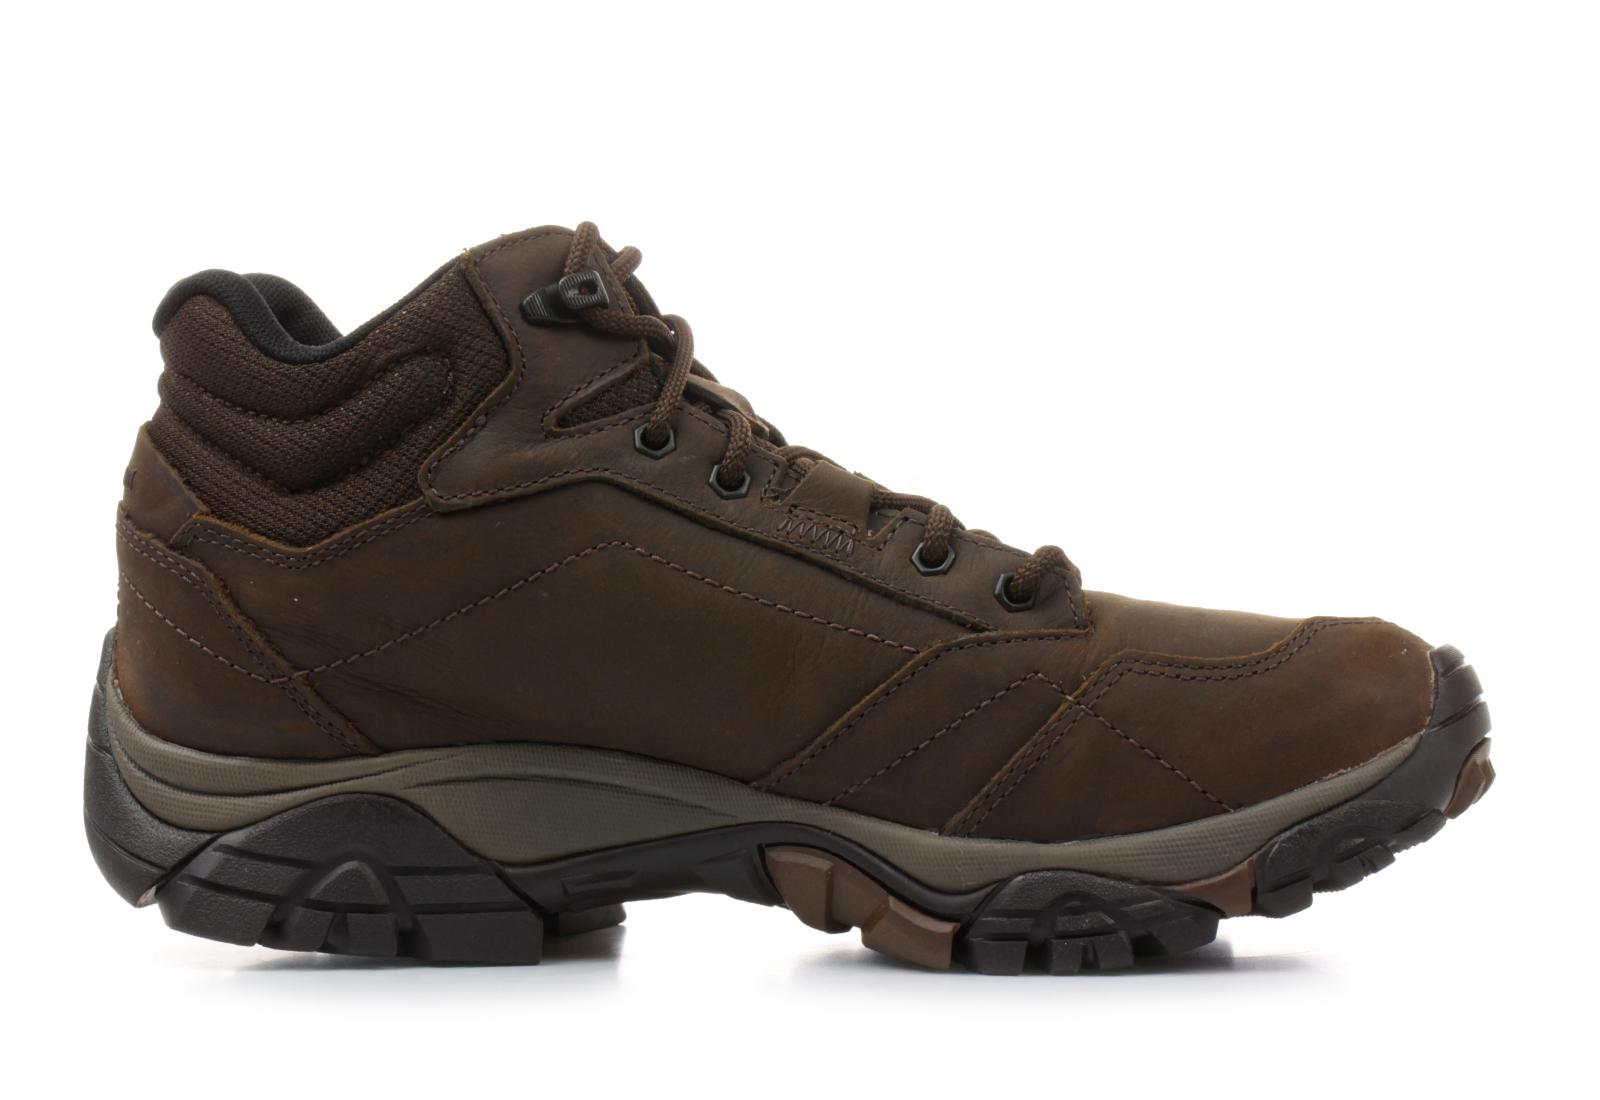 merrell boots moab adventure mid waterproof j91819 brn